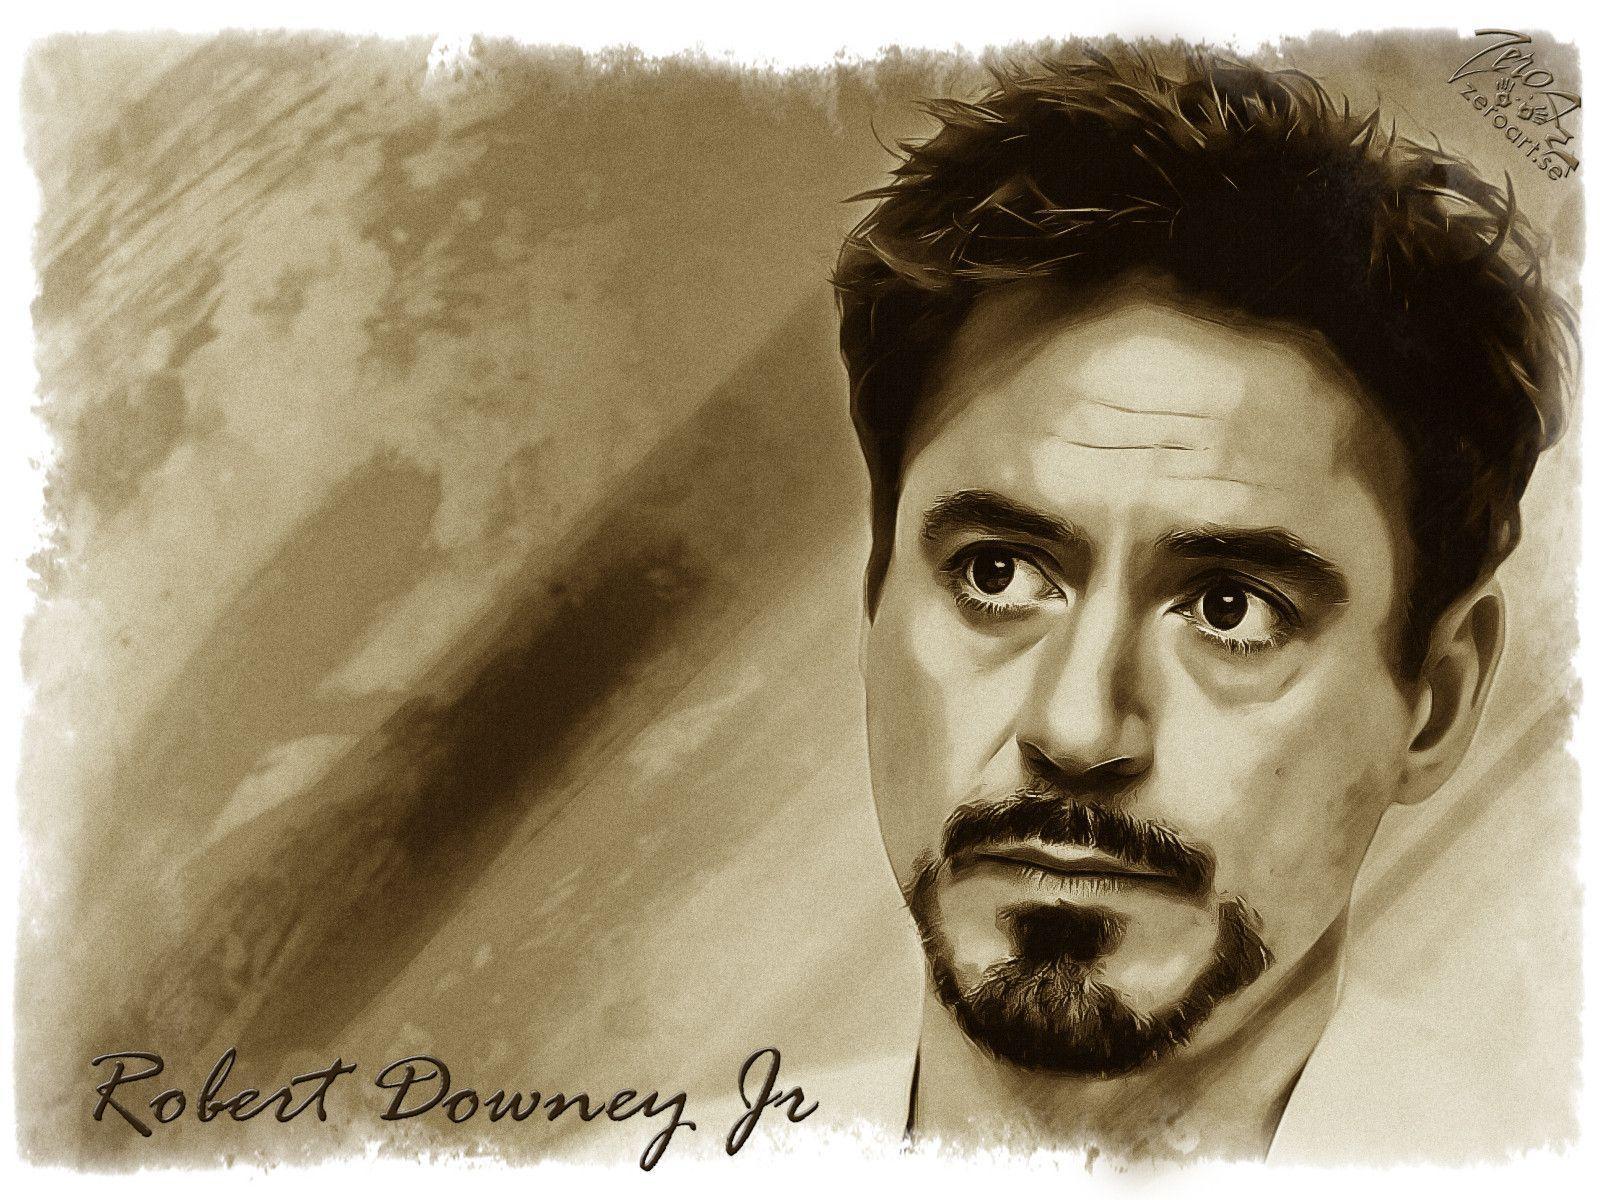 RDJ - Robert Downey Jr. Wallpaper (19390446) - Fanpop